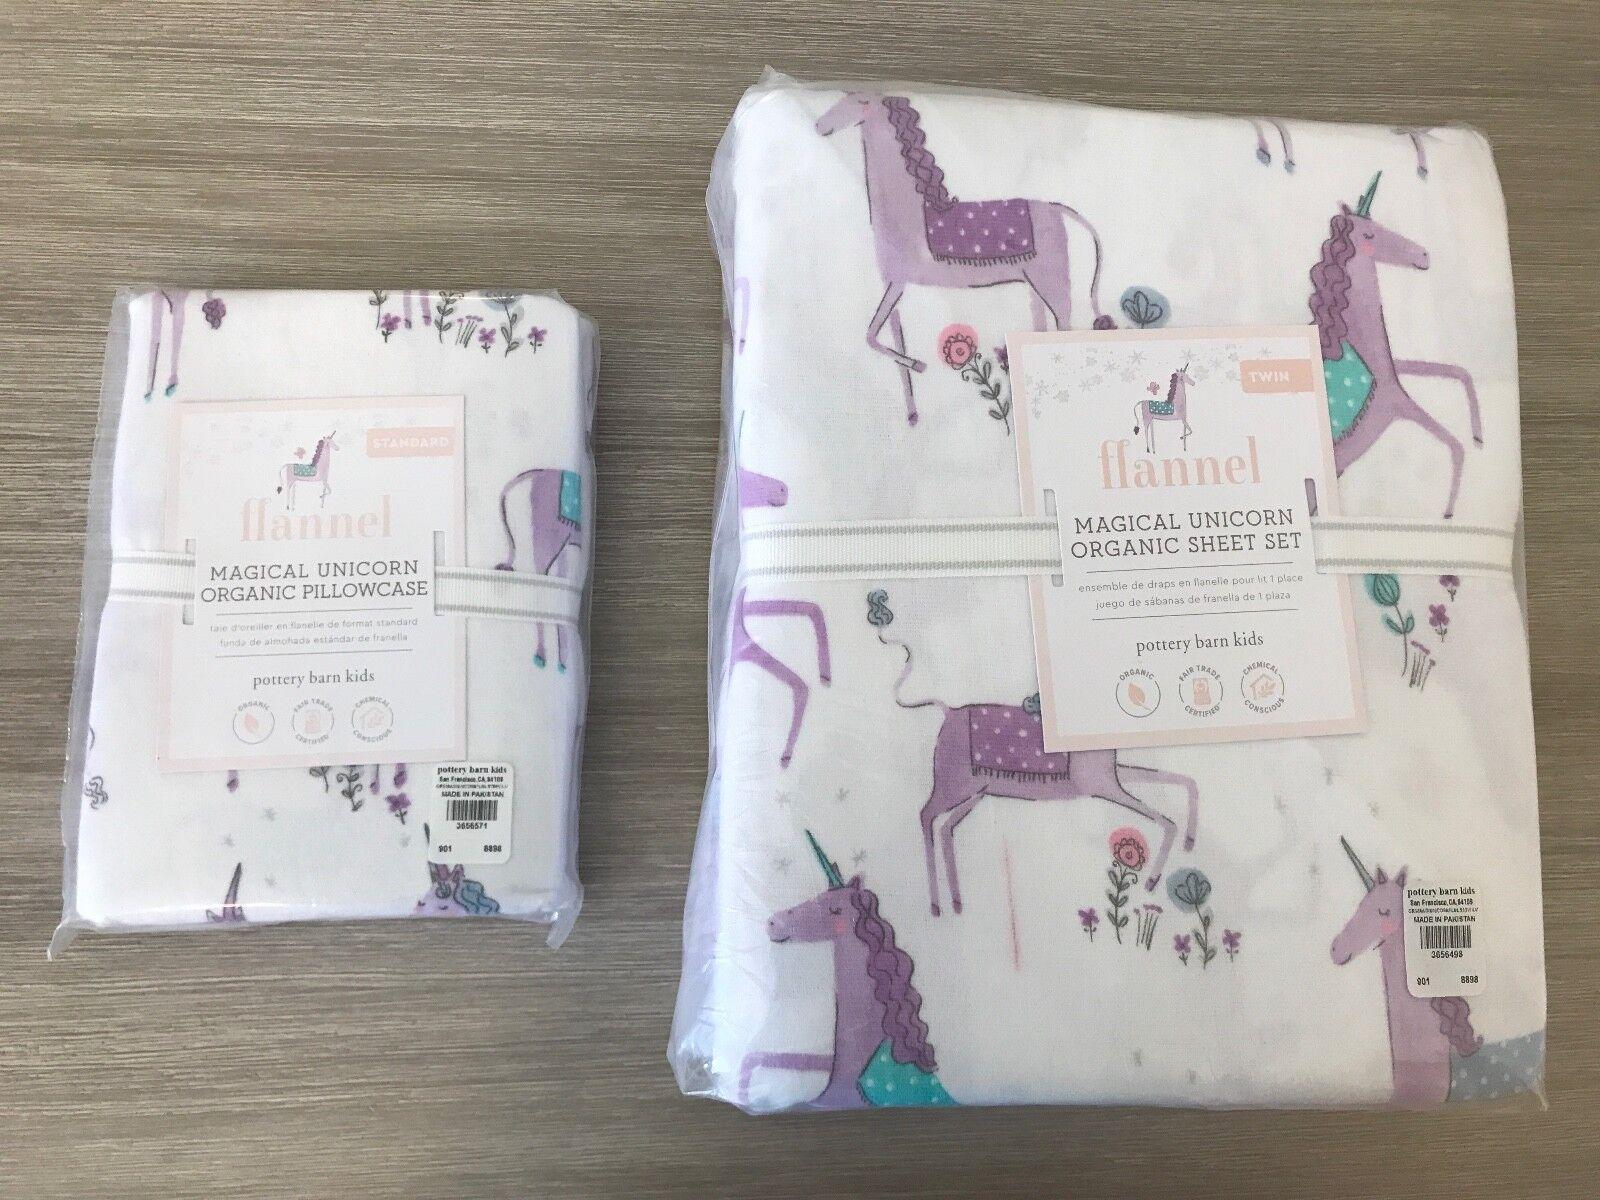 POTTERY BARN KIDS New Neuf avec étiquettes Twin Sheet Set Organique Violet licornes + 1 Extra Case